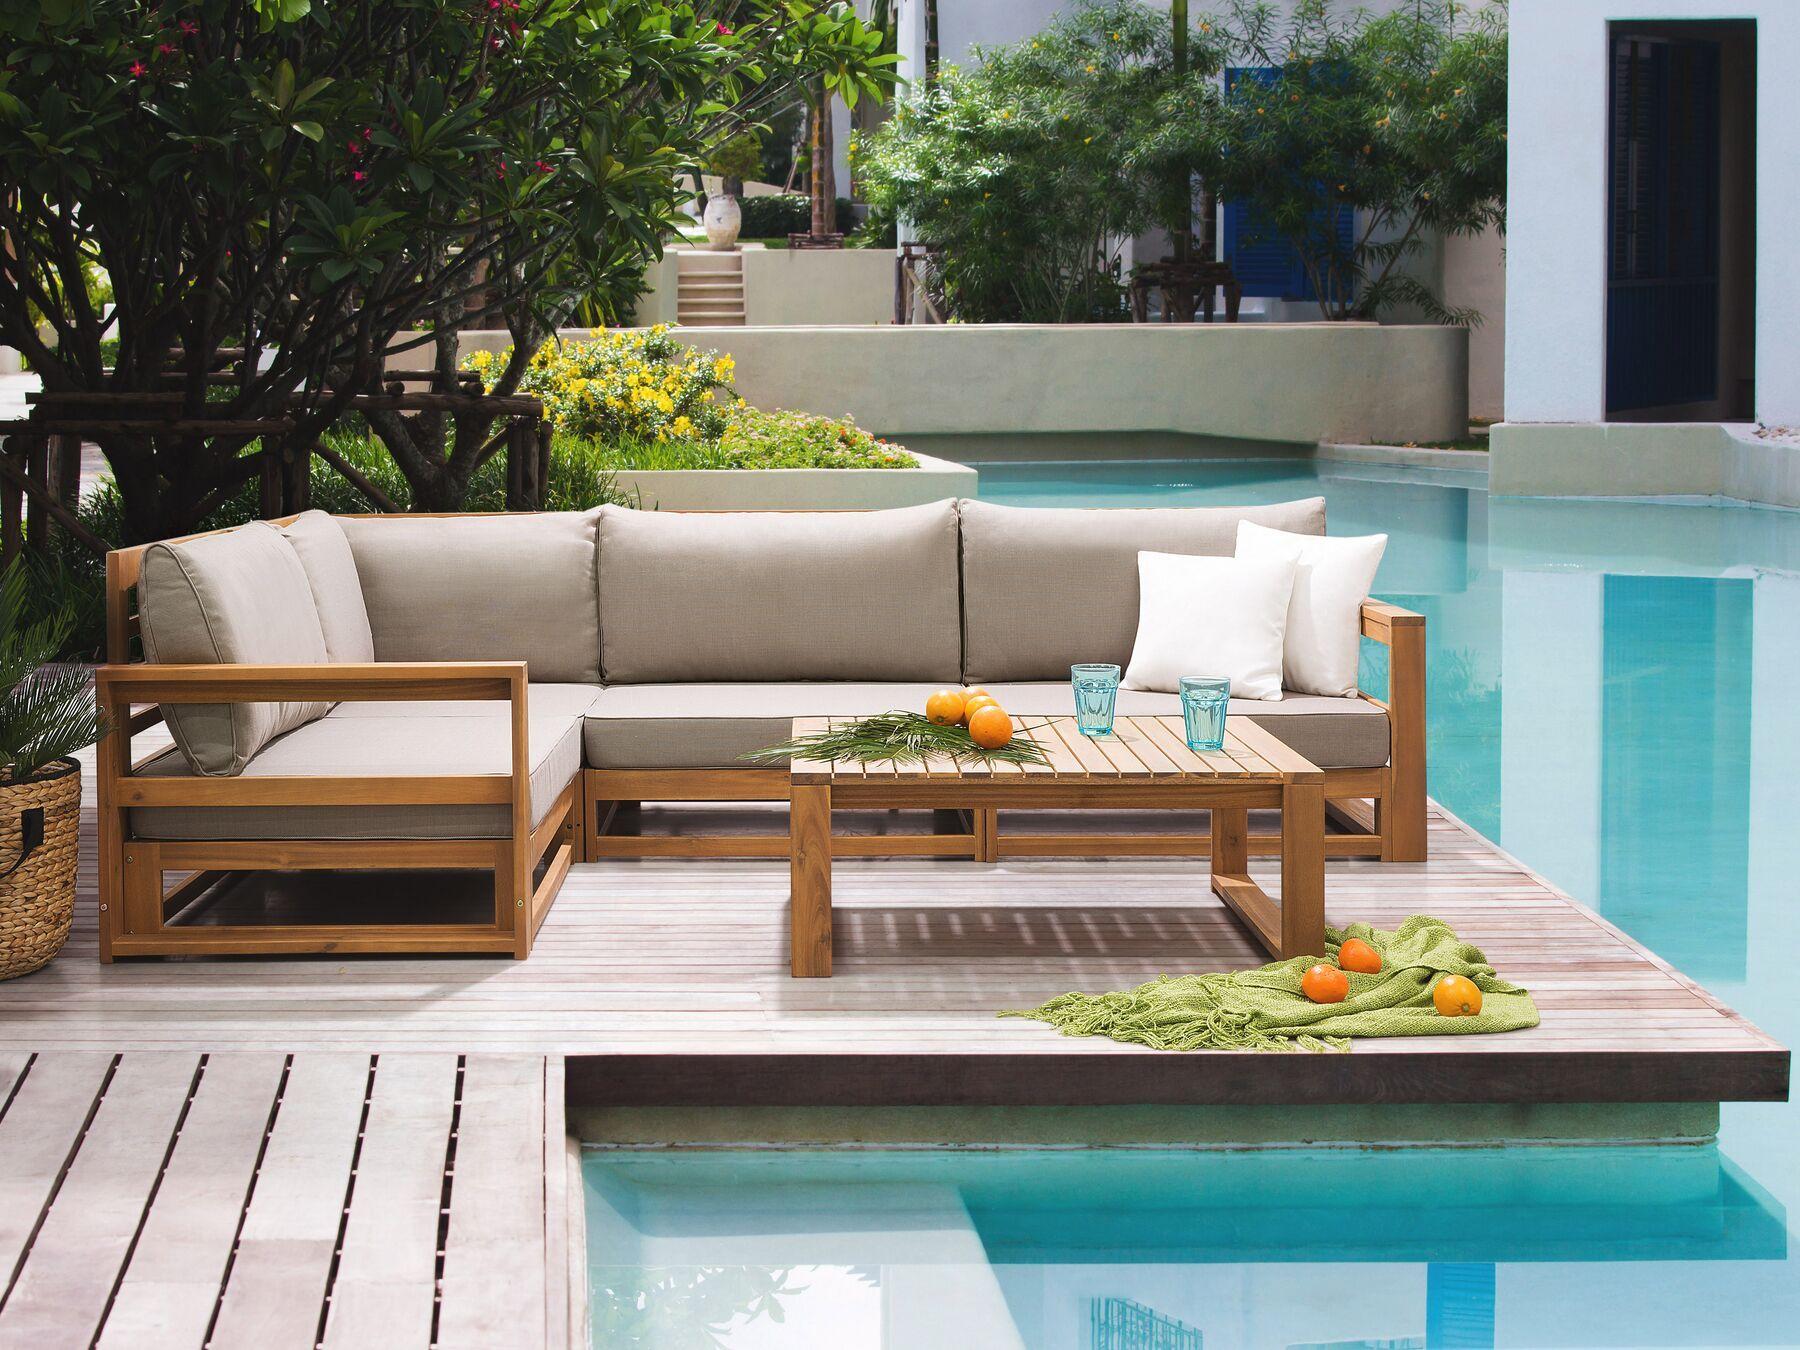 Dřevěná Zahradní Sedací Souprava Timor In 2020 Garden Sofa Set Garden Sofa Outdoor Sofa Sets